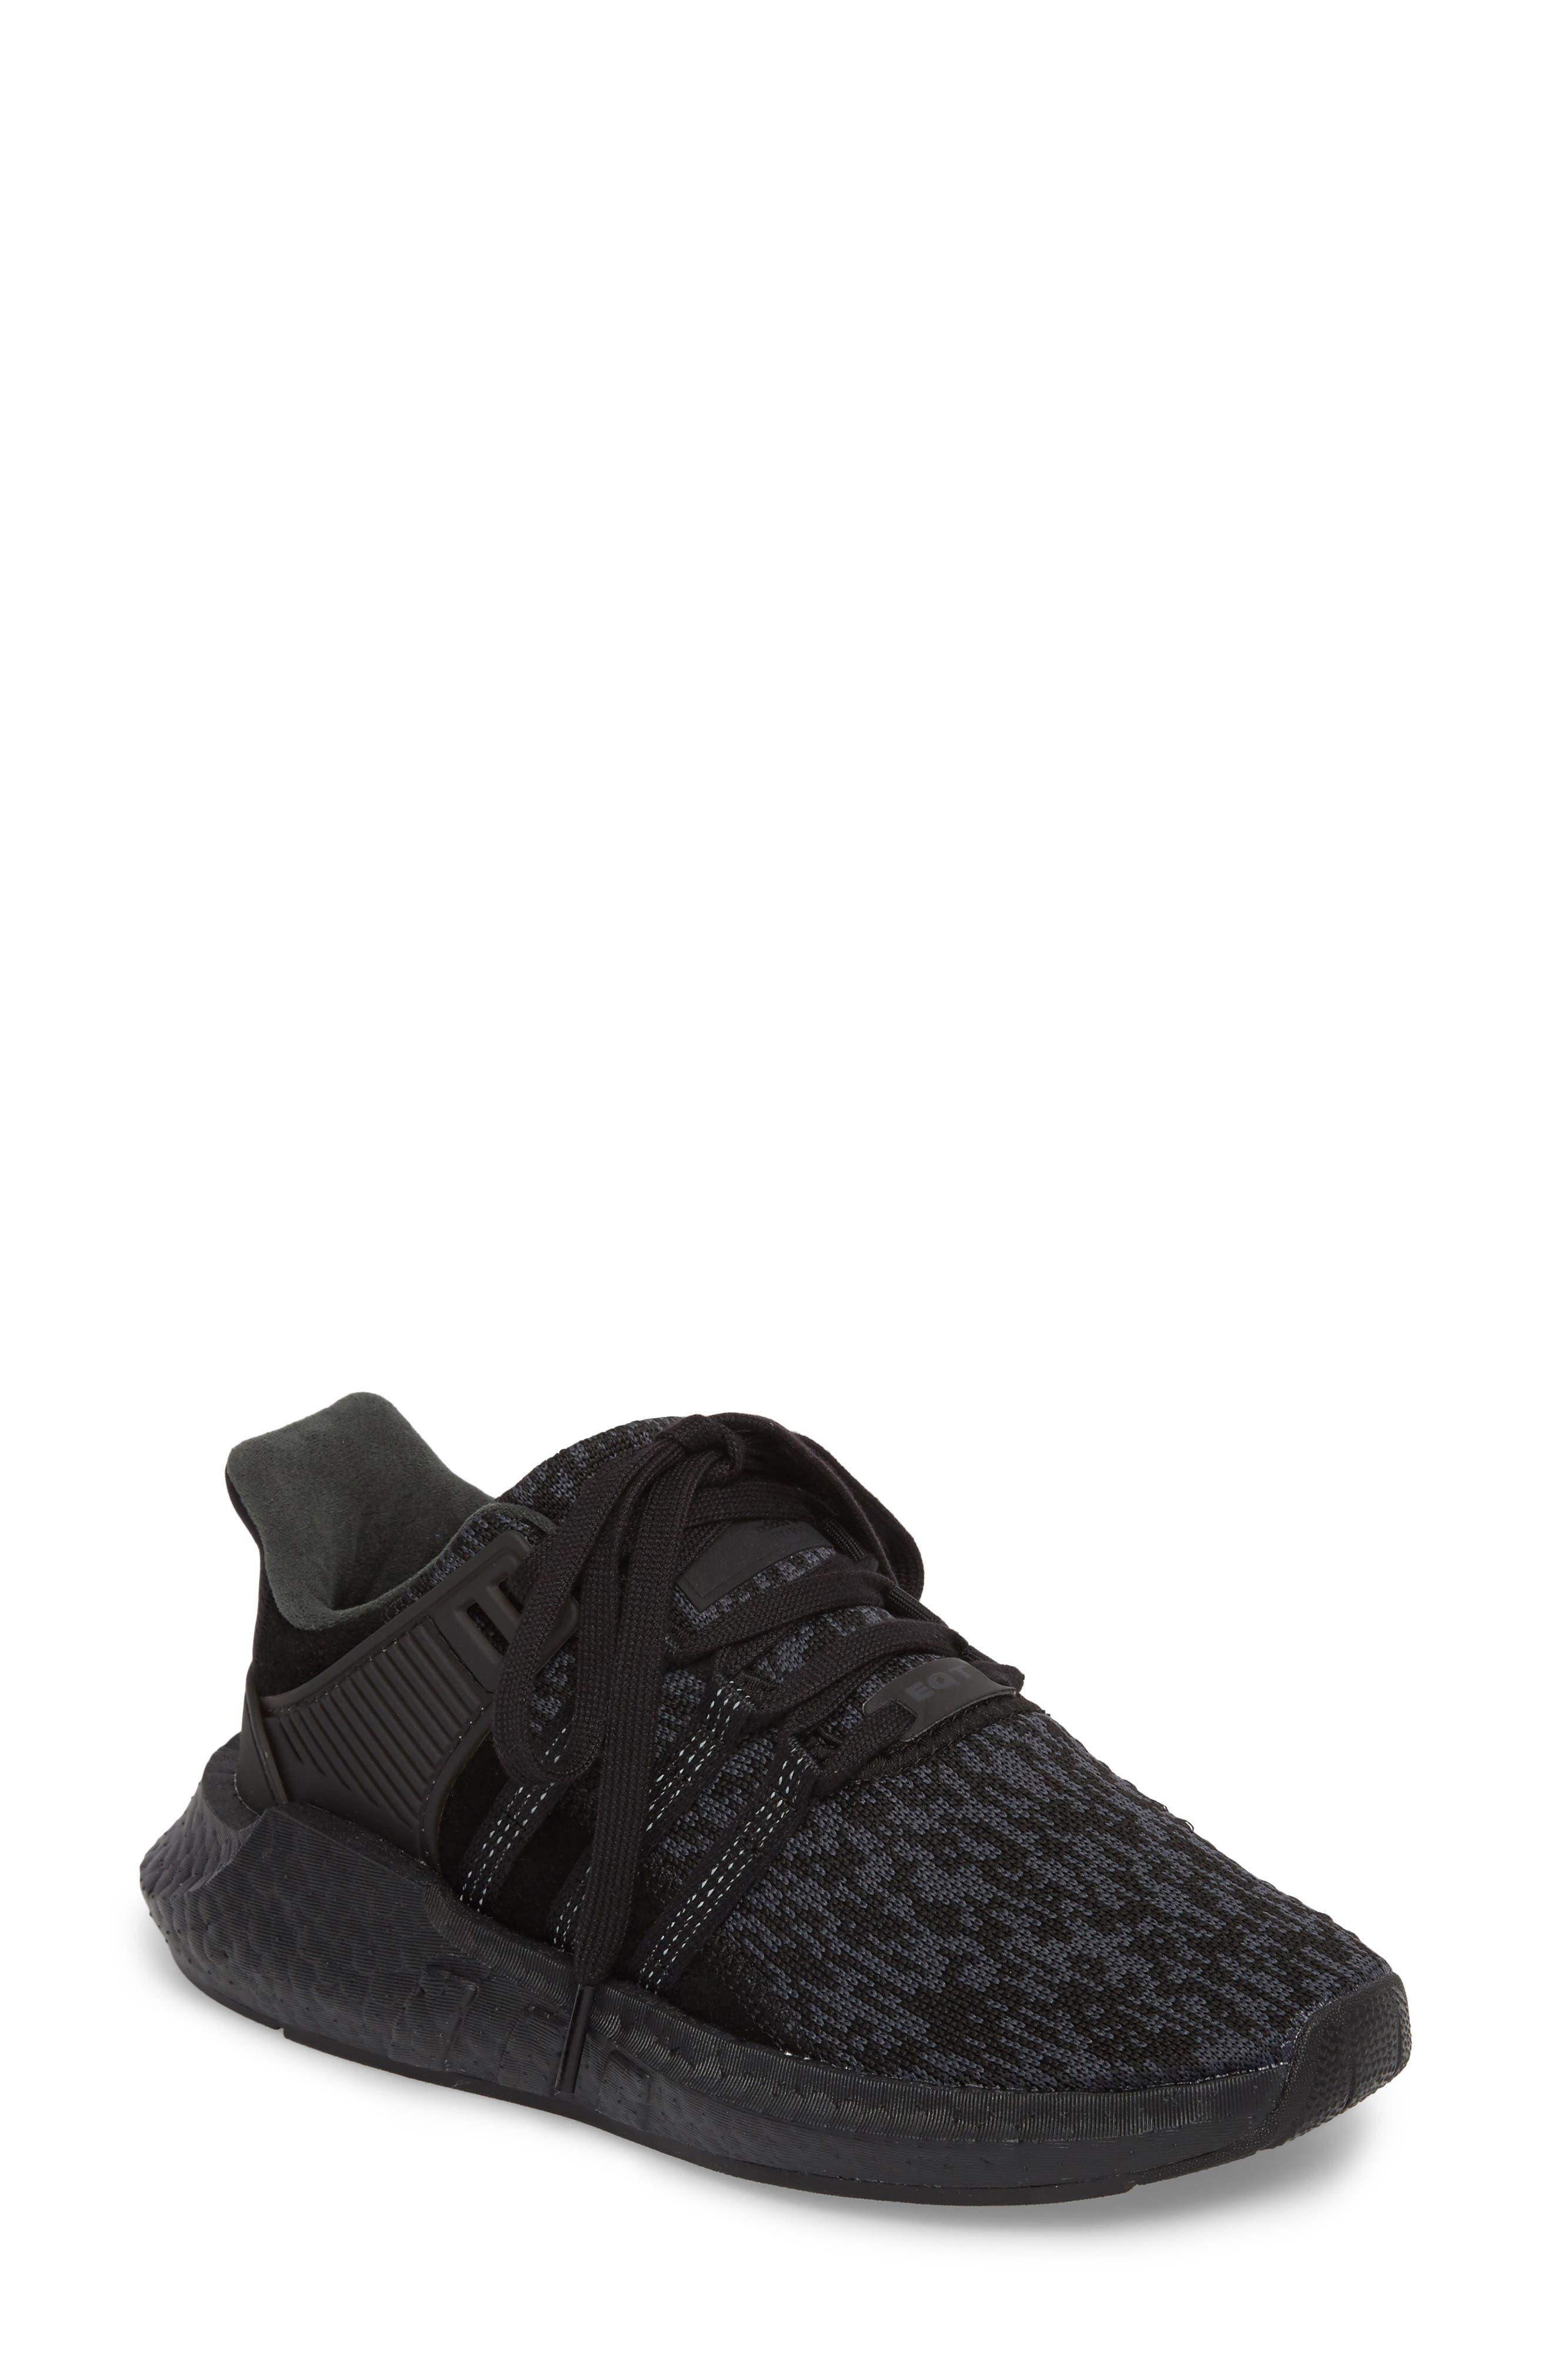 Main Image - adidas EQT Support 93/17 Sneaker (Women)